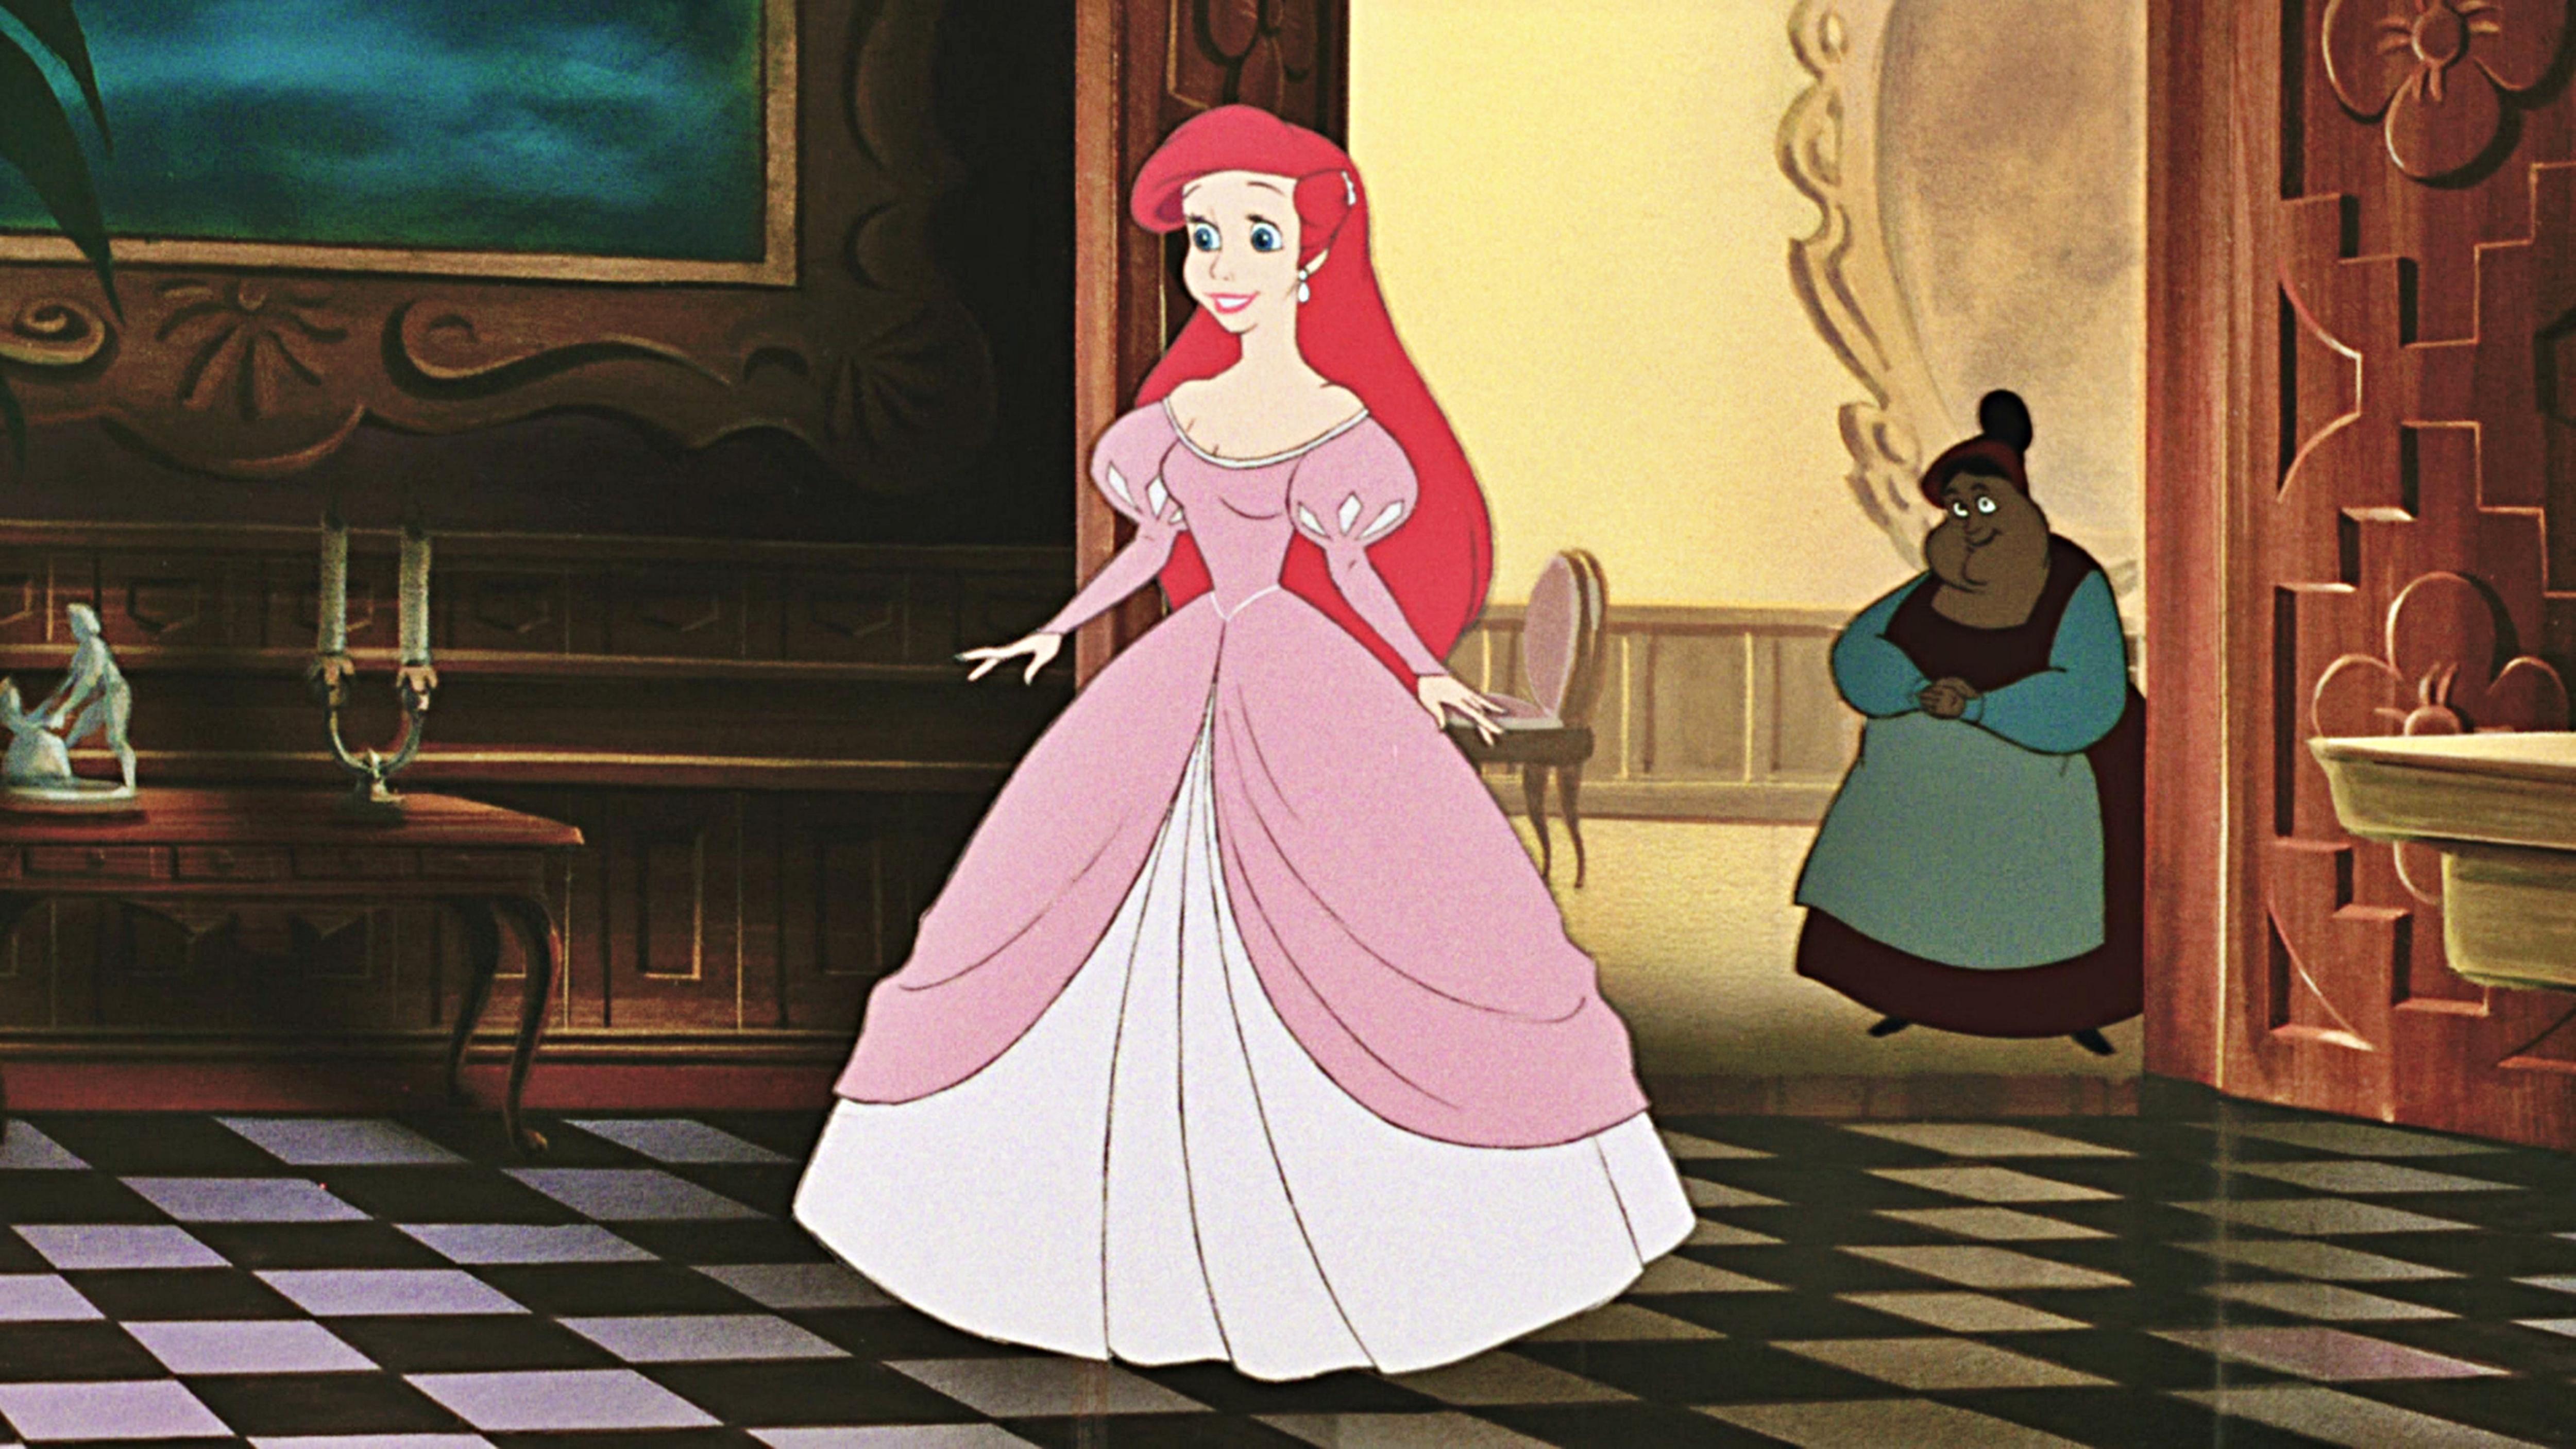 News And Entertainment Disney Princess Ariel Jan 04 2013 News And Entertainment Princess